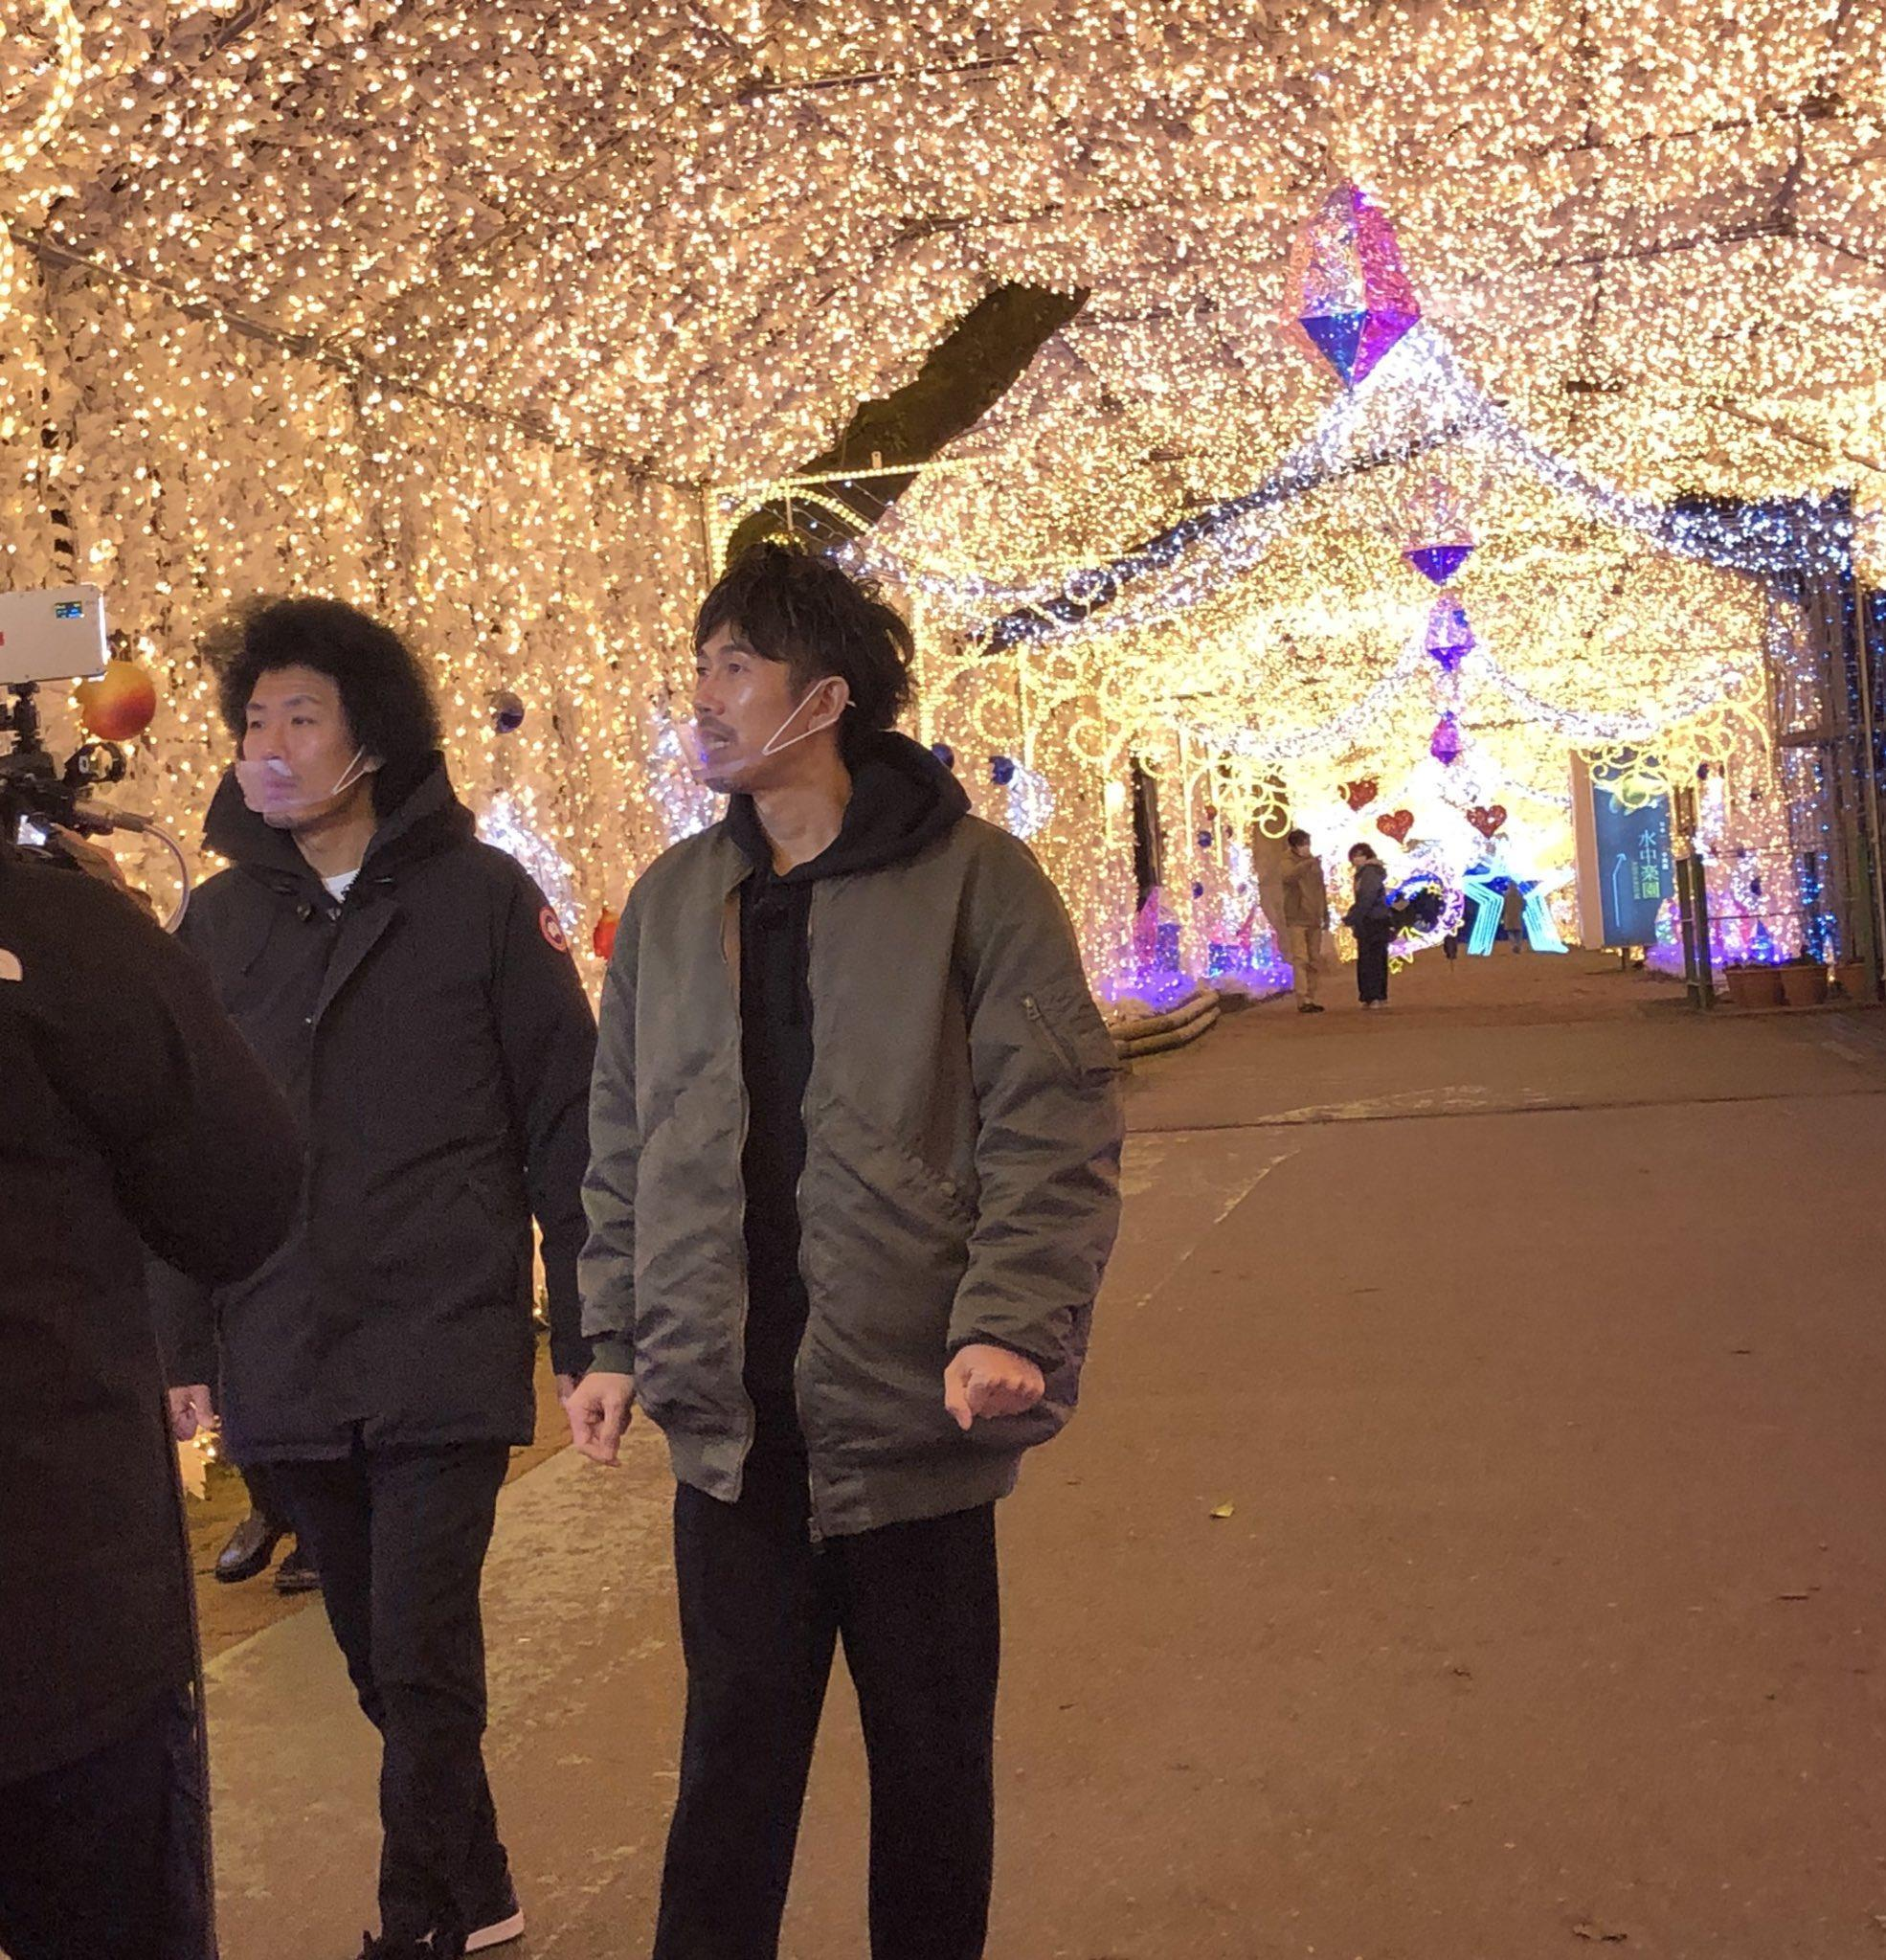 http://47web.jp/shizuoka/uploads/IMG_6396.jpg